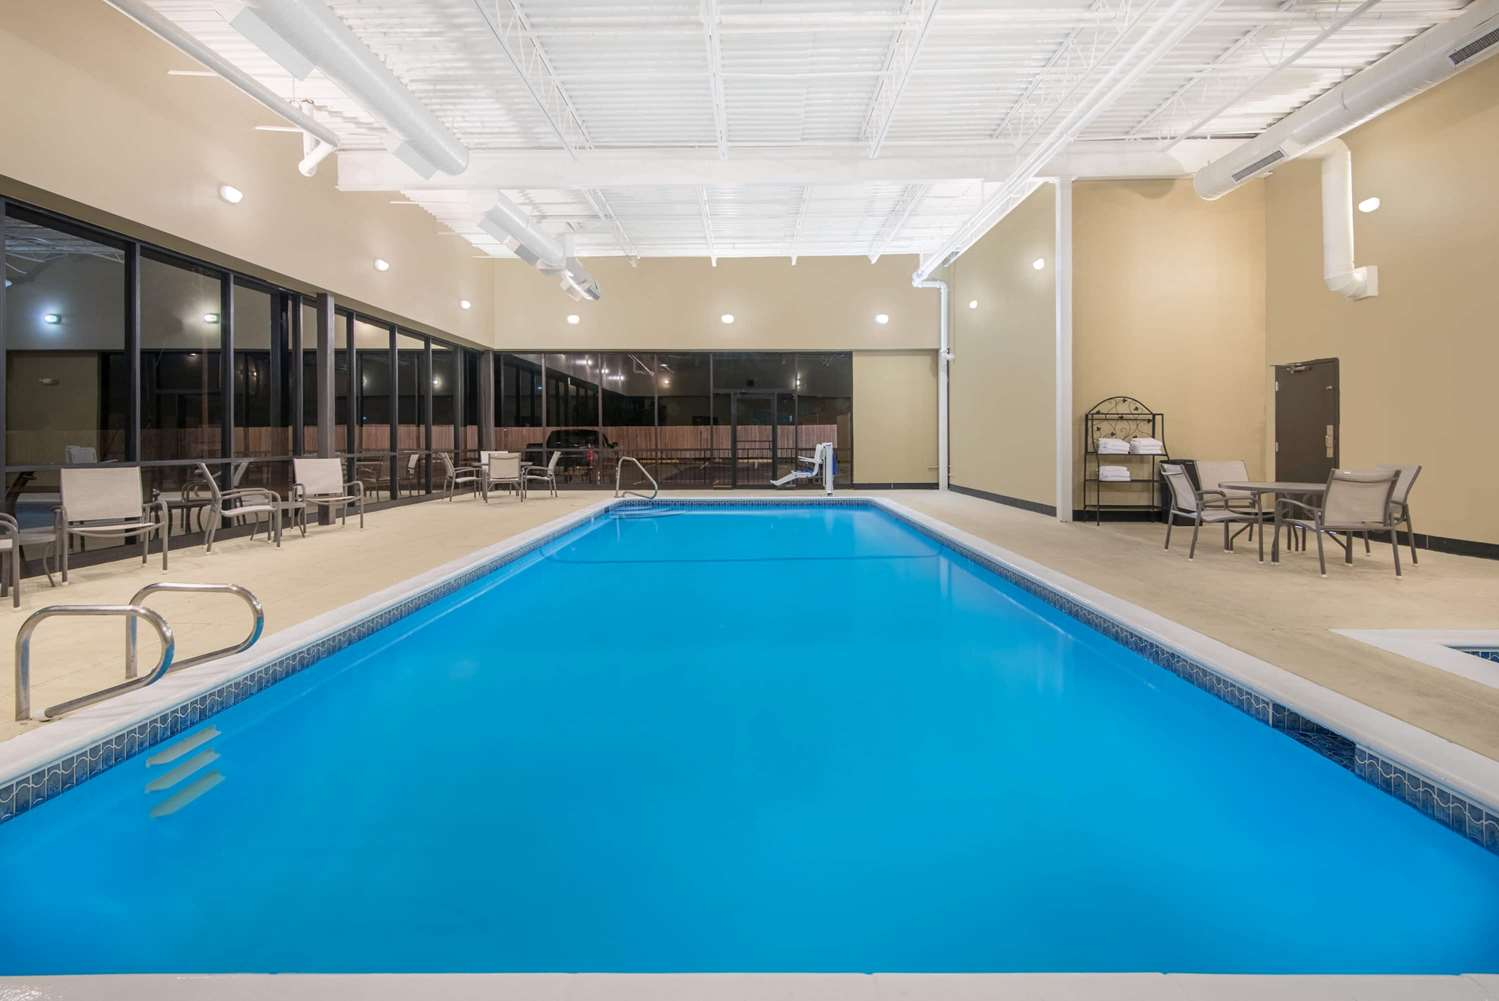 Pool - Wyndham Garden Hotel Texarkana